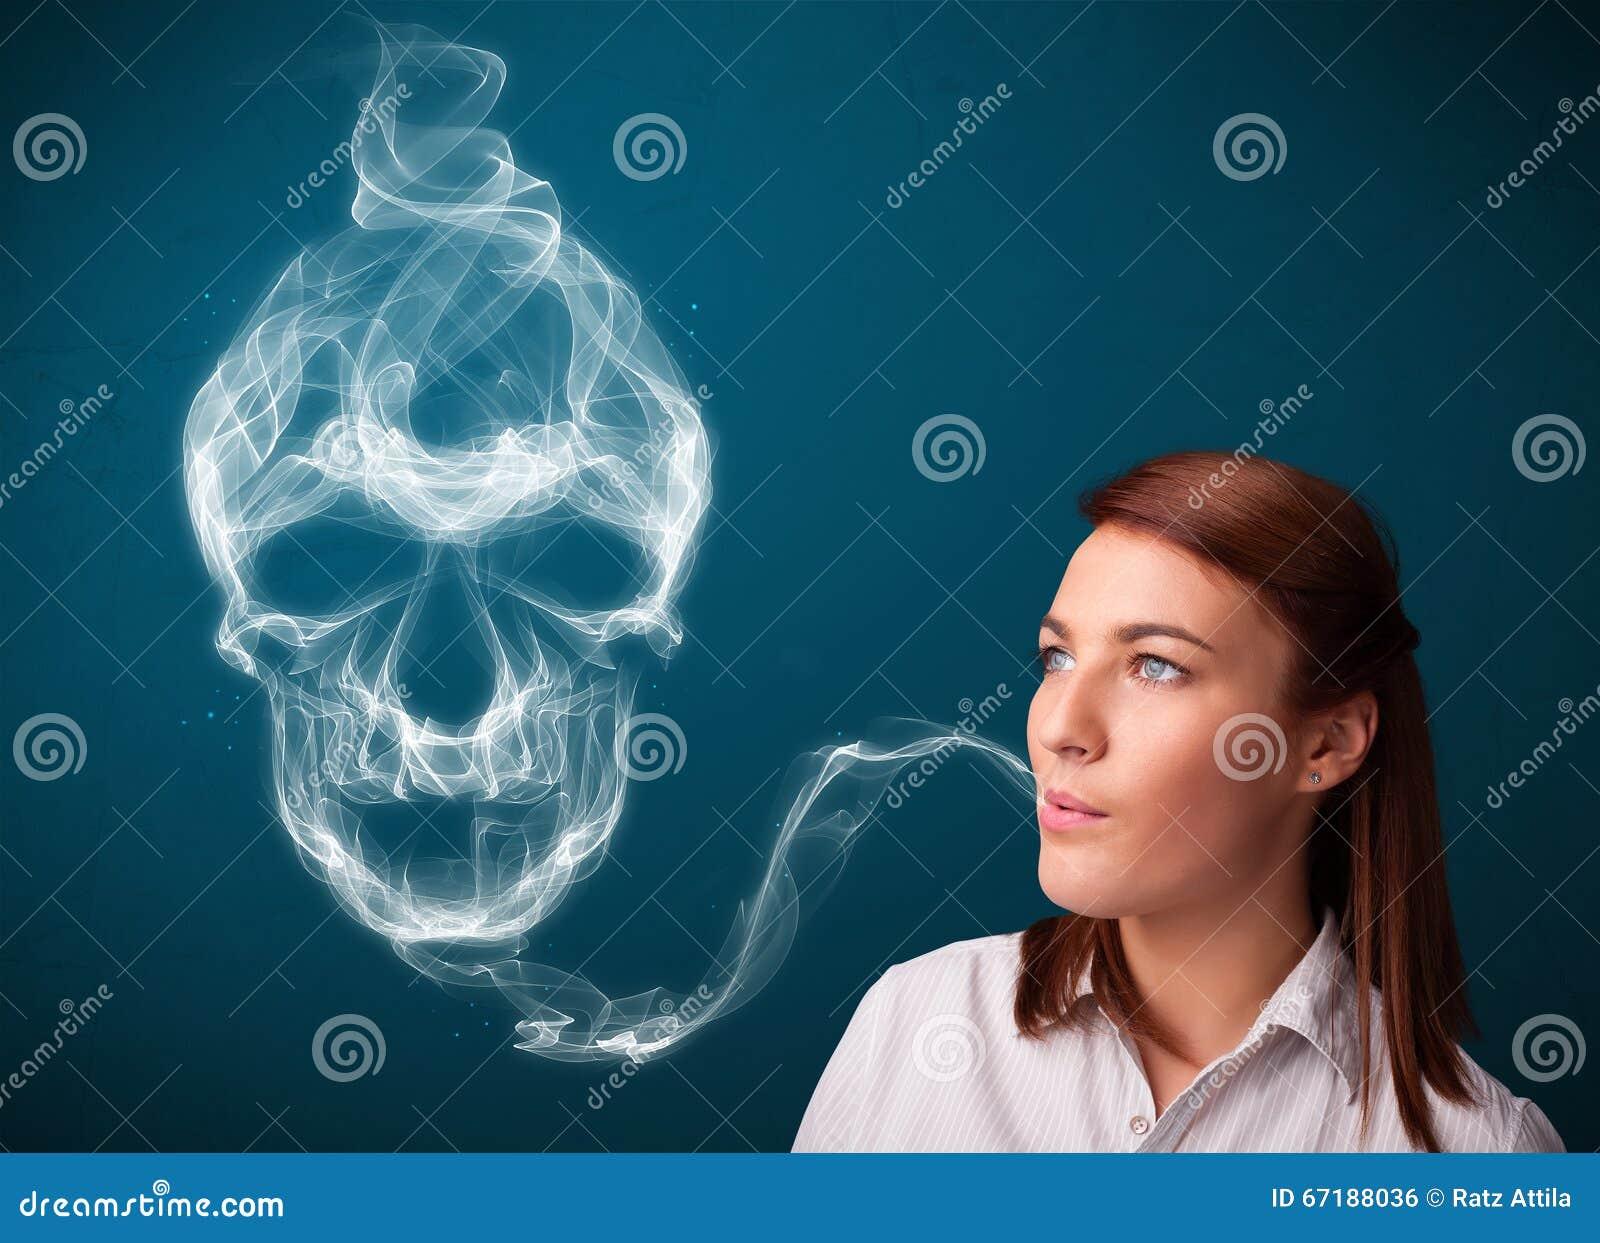 Young woman smoking dangerous cigarette with toxic skull smoke